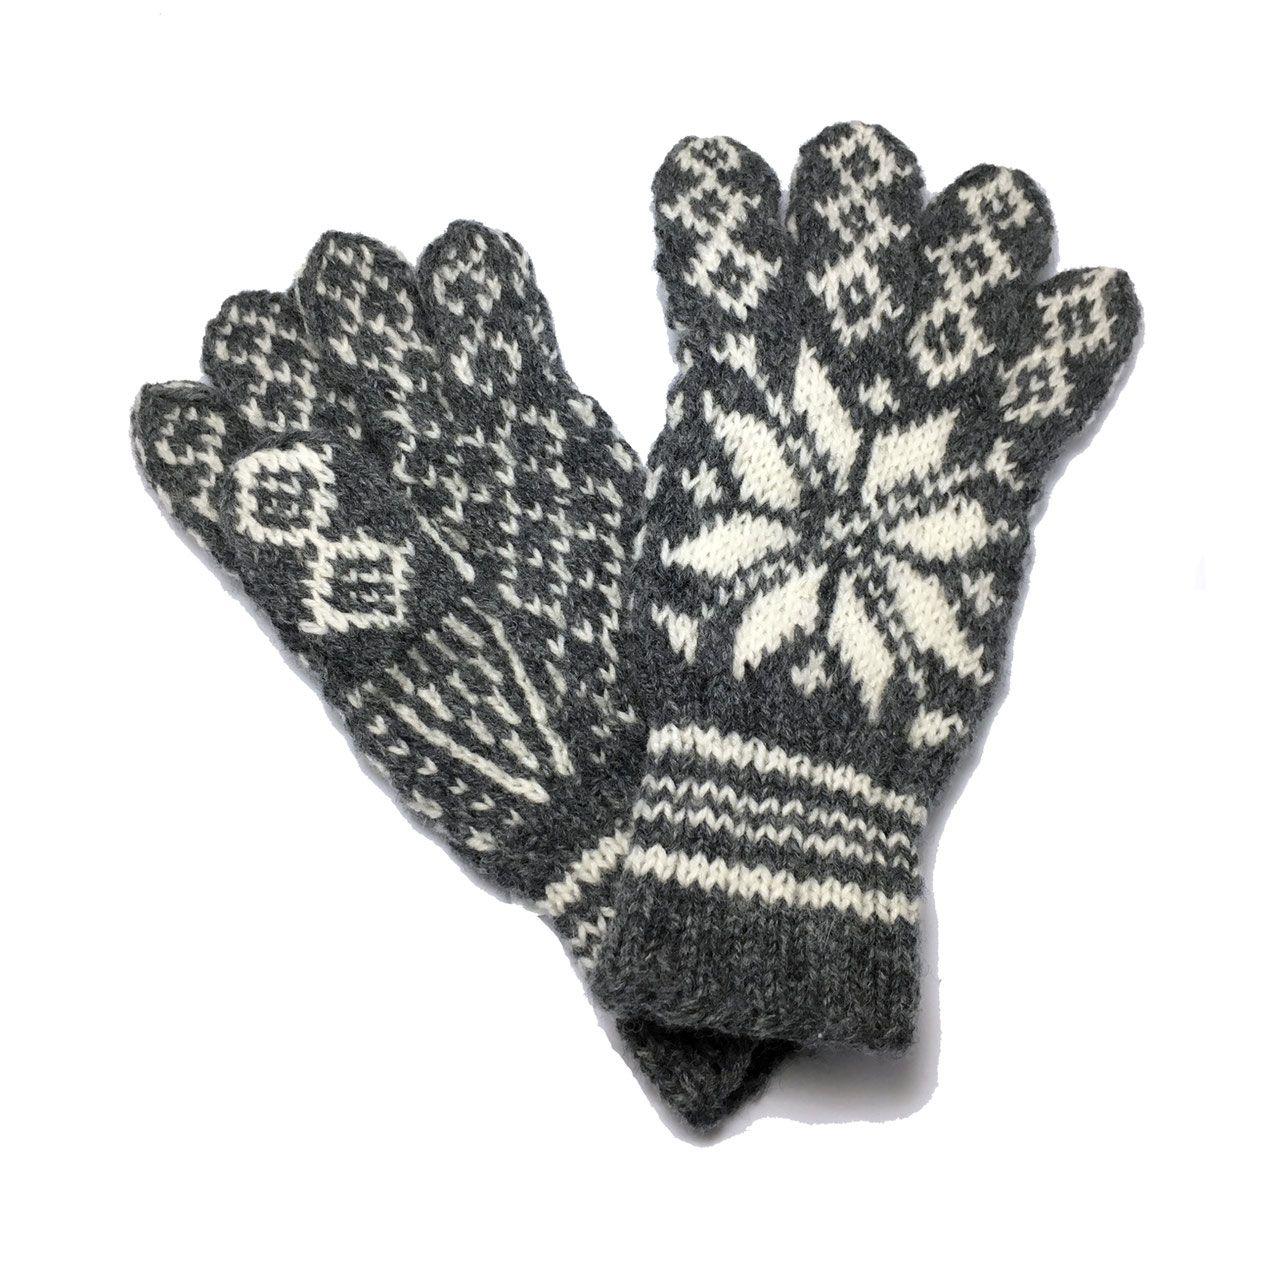 Knitted Camouflage Gloves Men Wool Gloves Hunter Green Etsy In 2020 Wool Gloves Knitted Fingerless